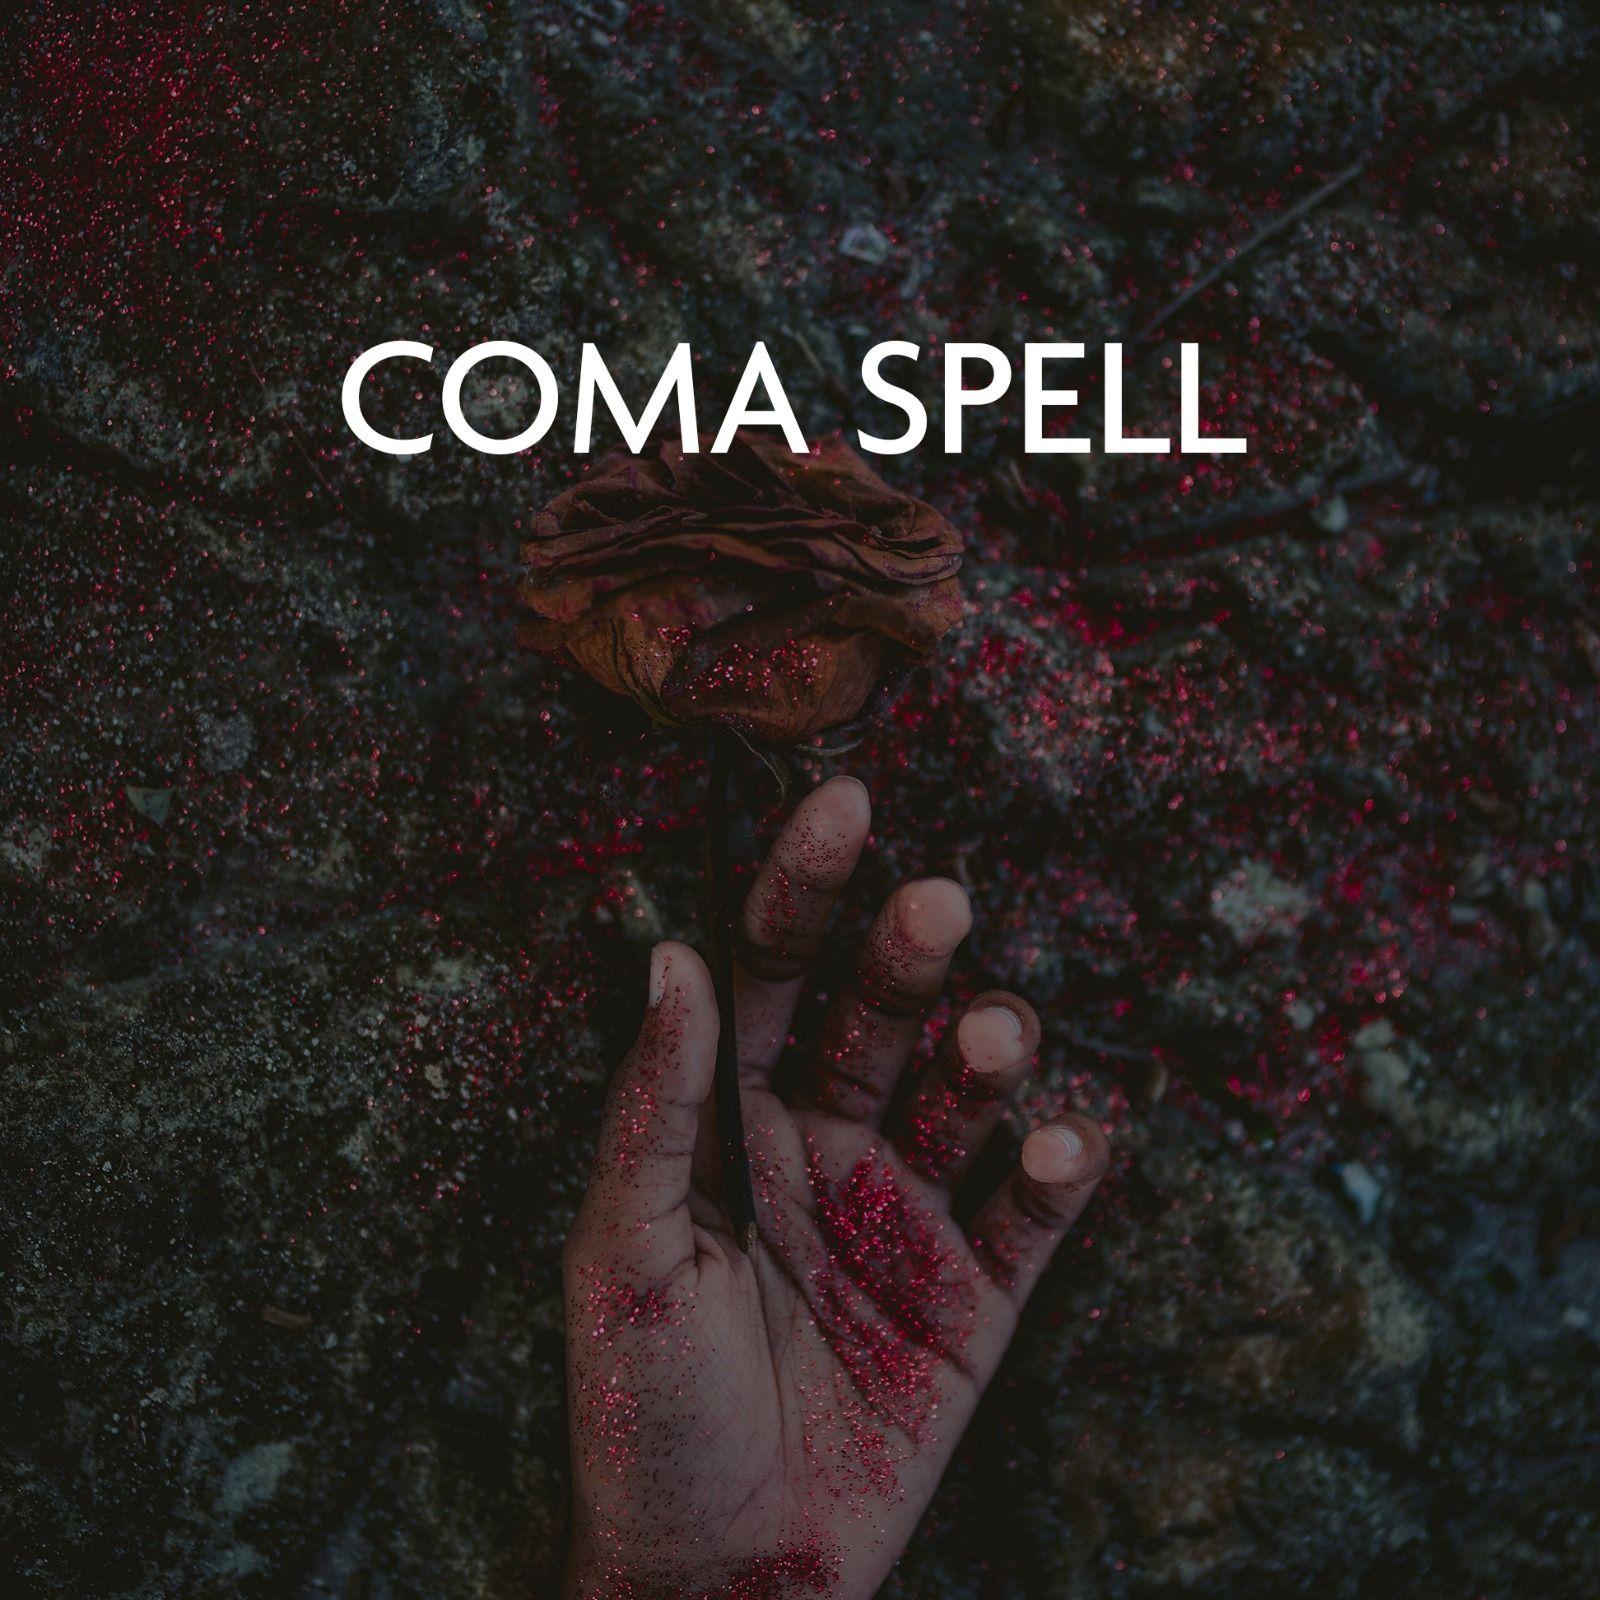 Coma Spell